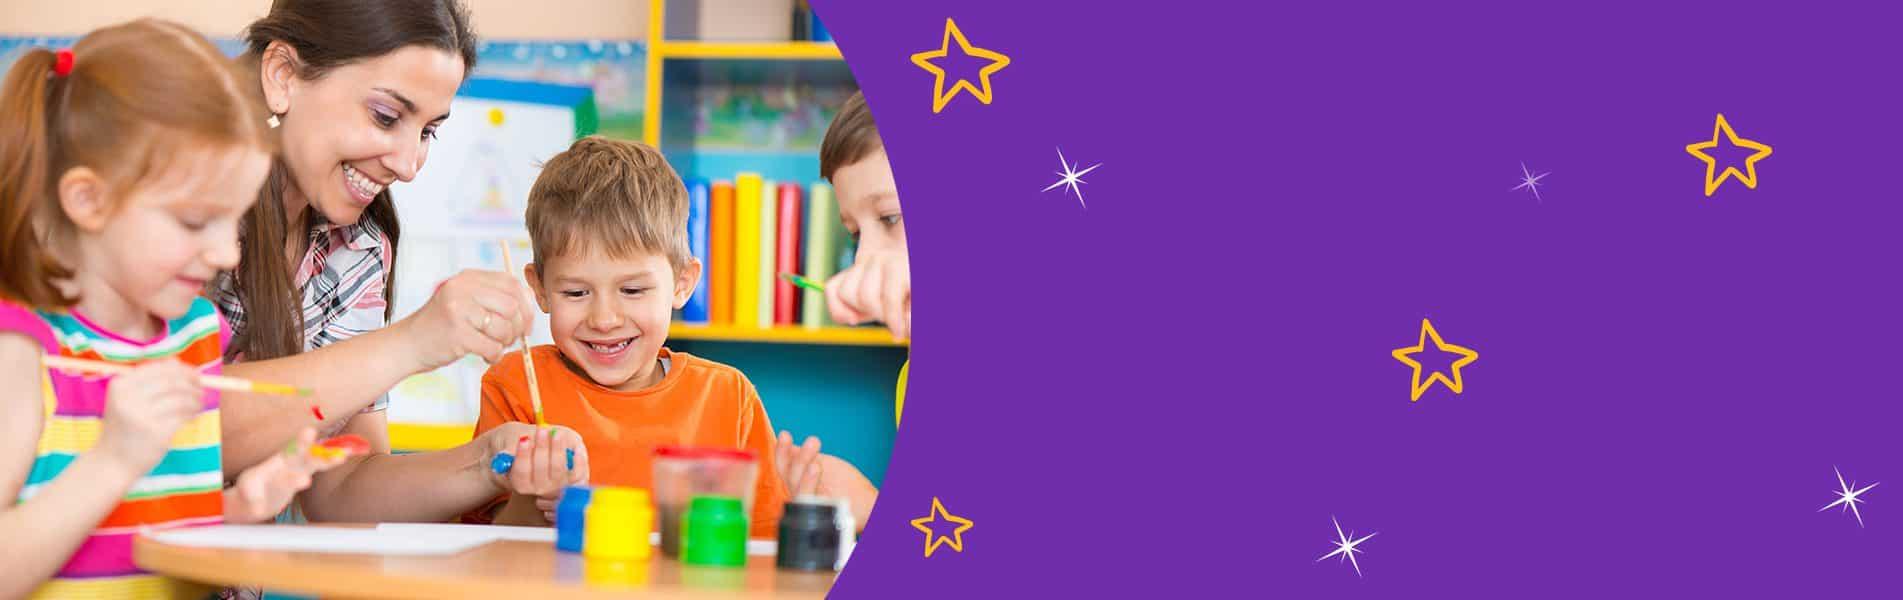 Pedagogical Leader Award